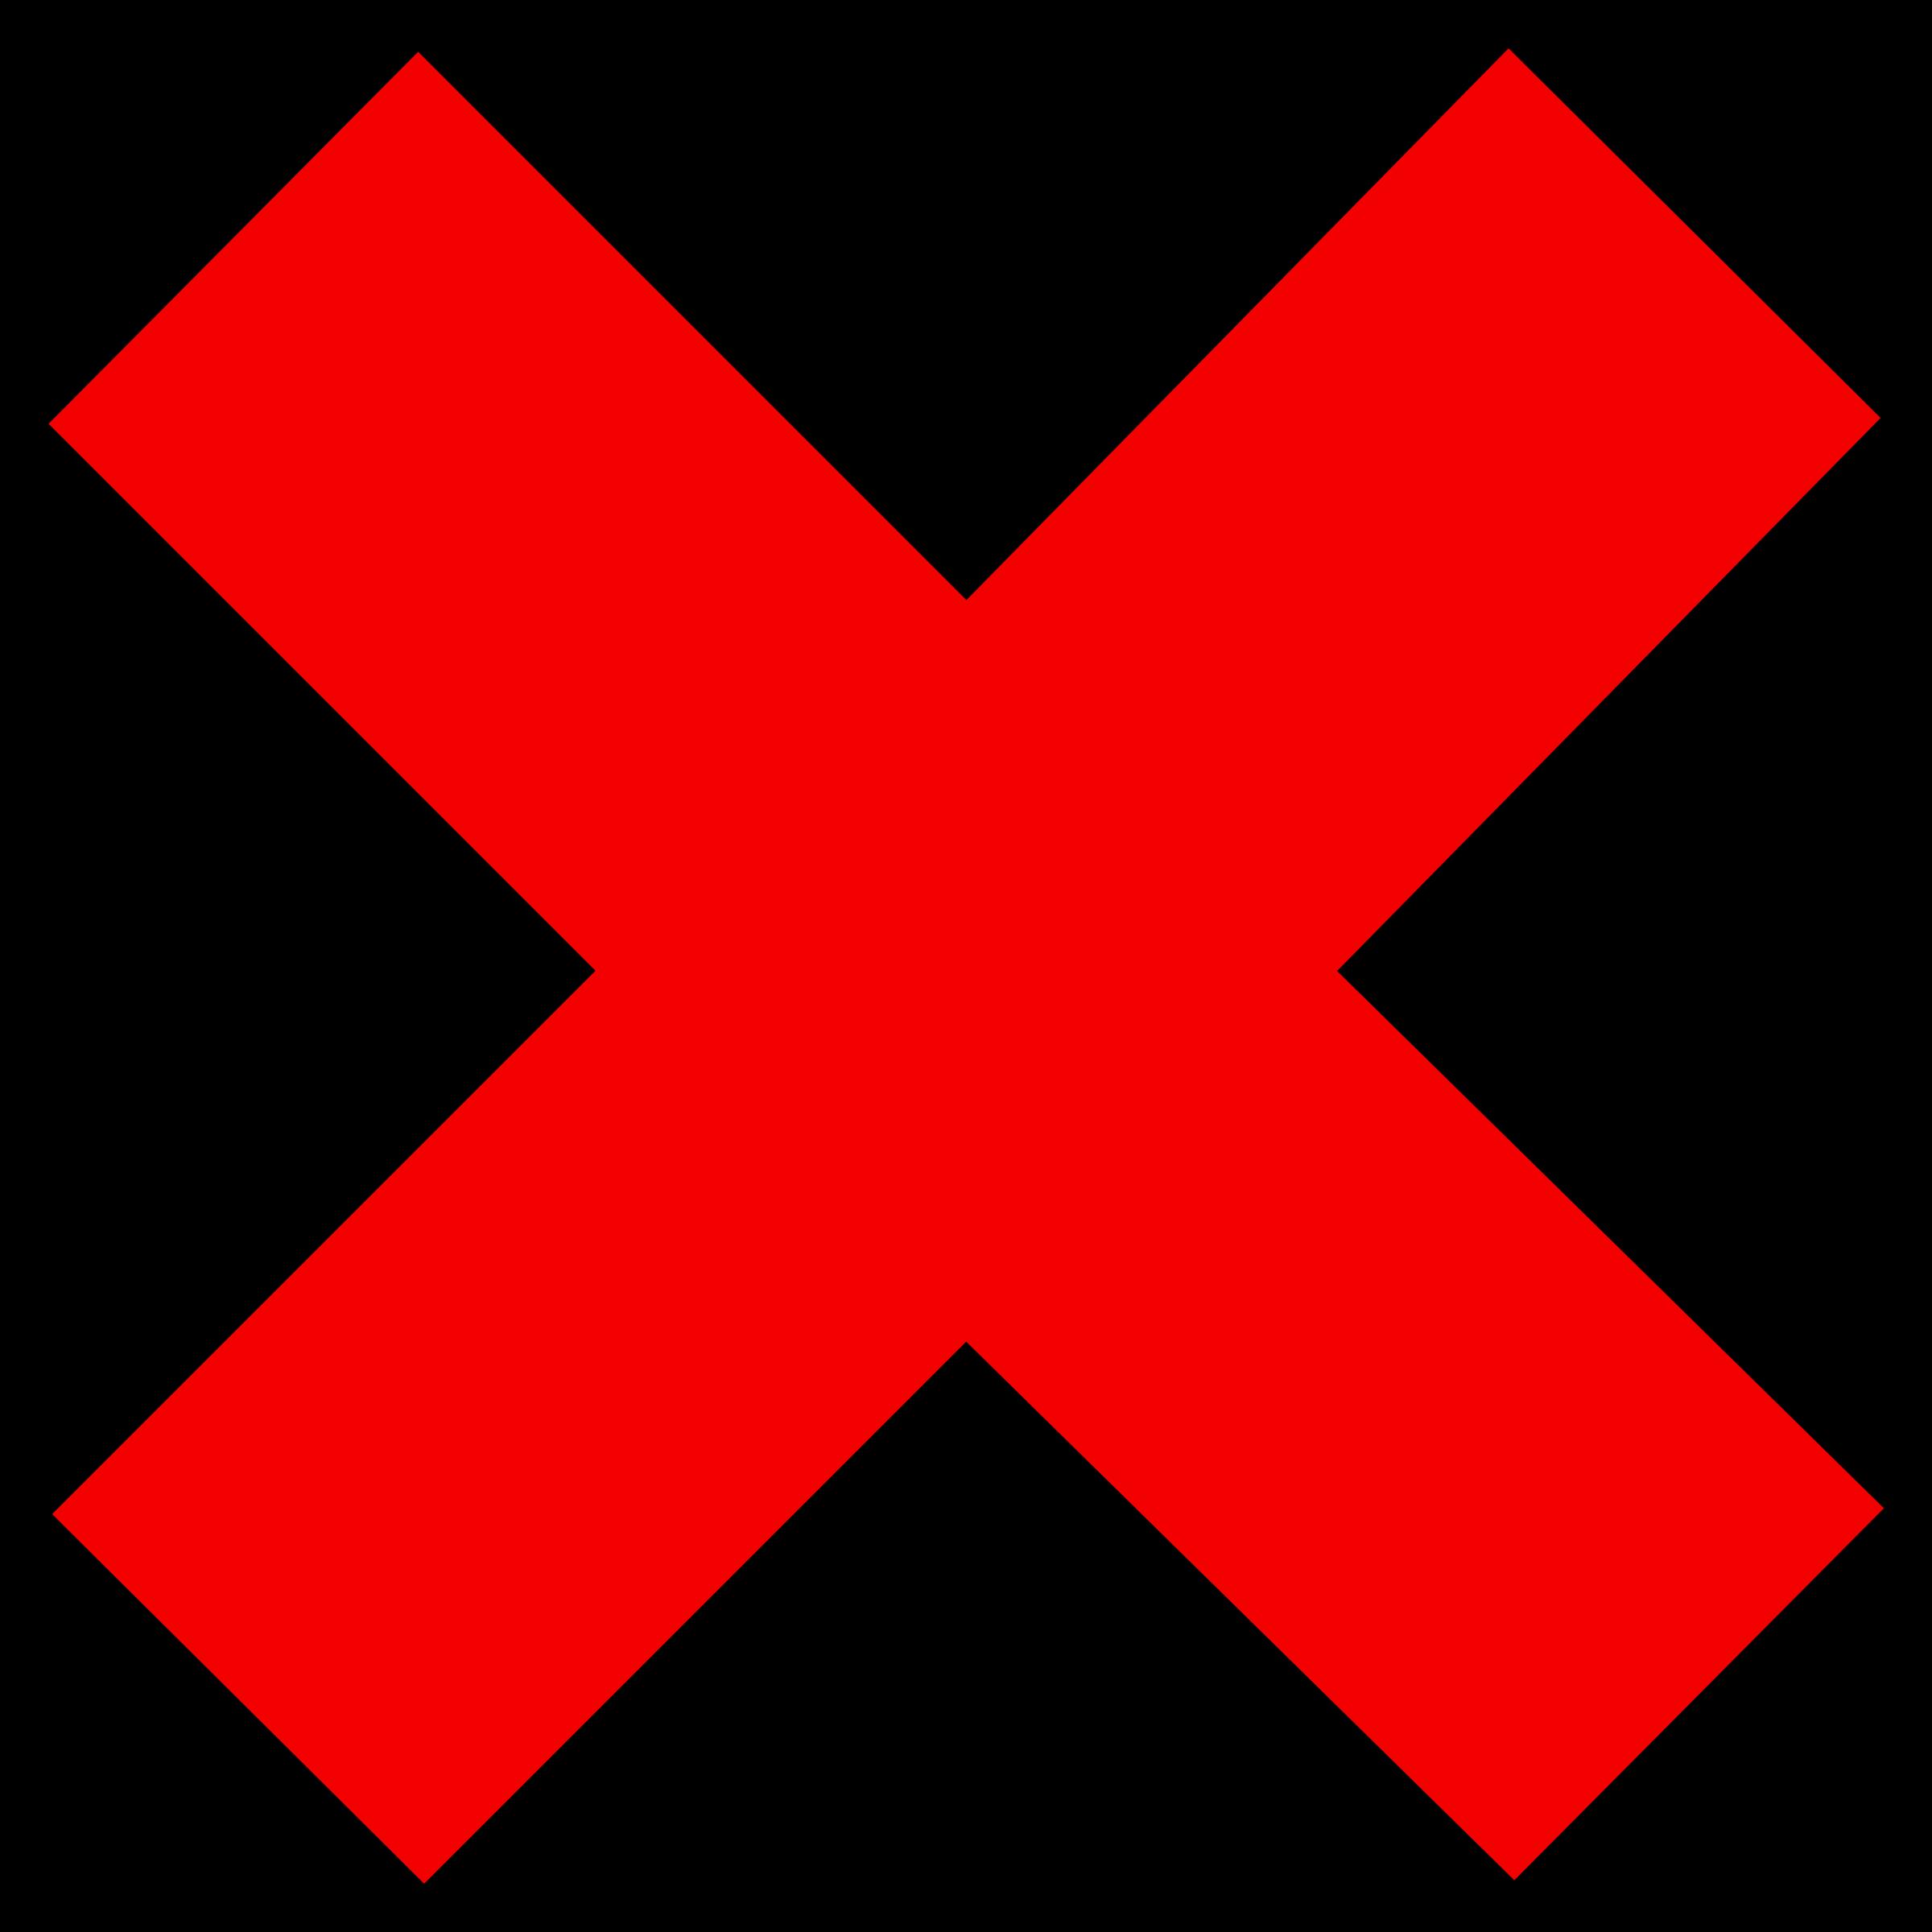 2400x2400 Clip Art Red Cross Images Clip Art